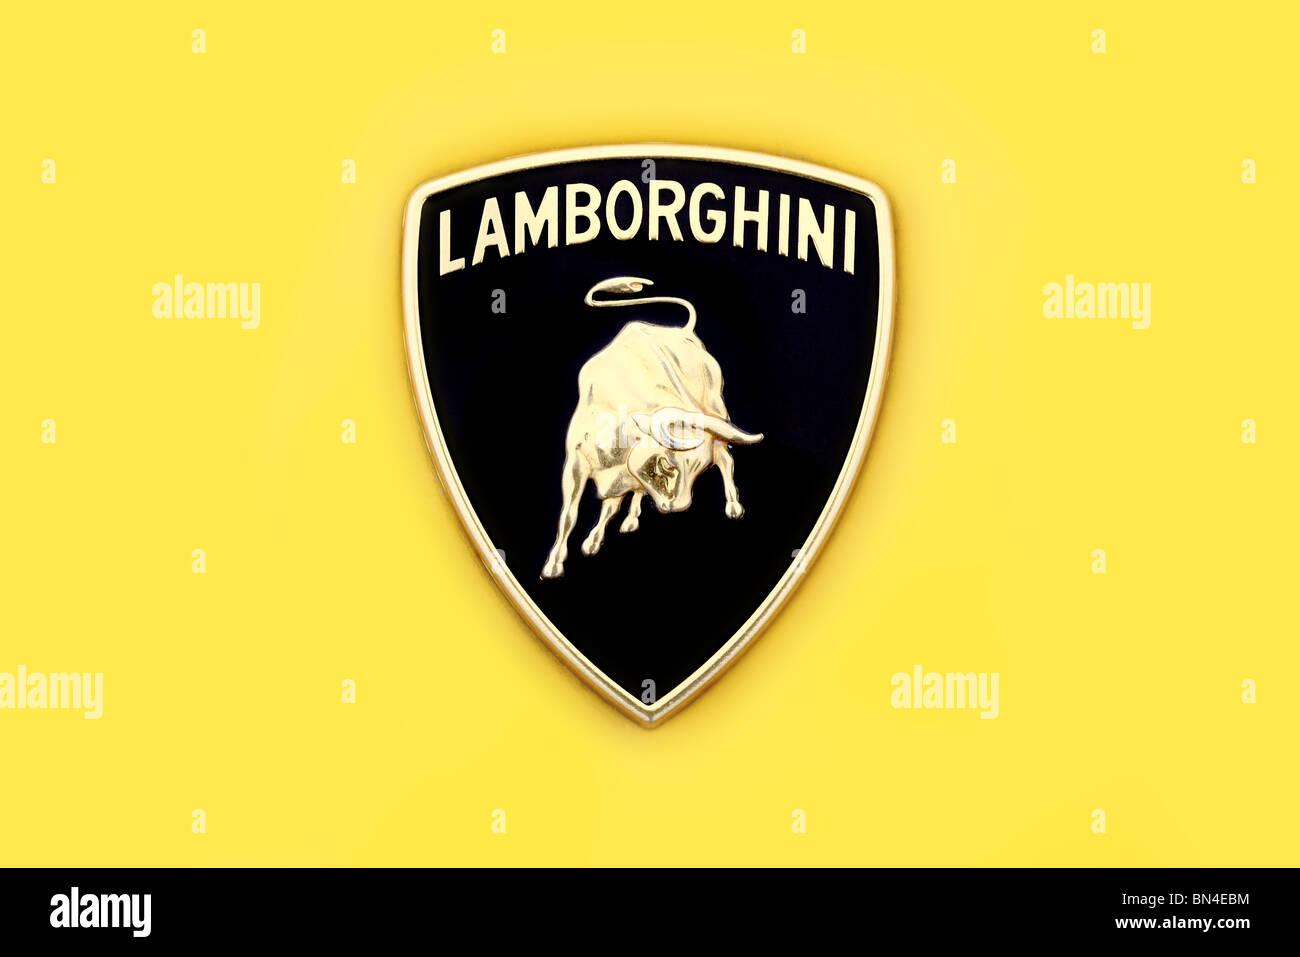 Lamborghini Car Manufacturer Hood Ornament Badge Logo Stock Photo